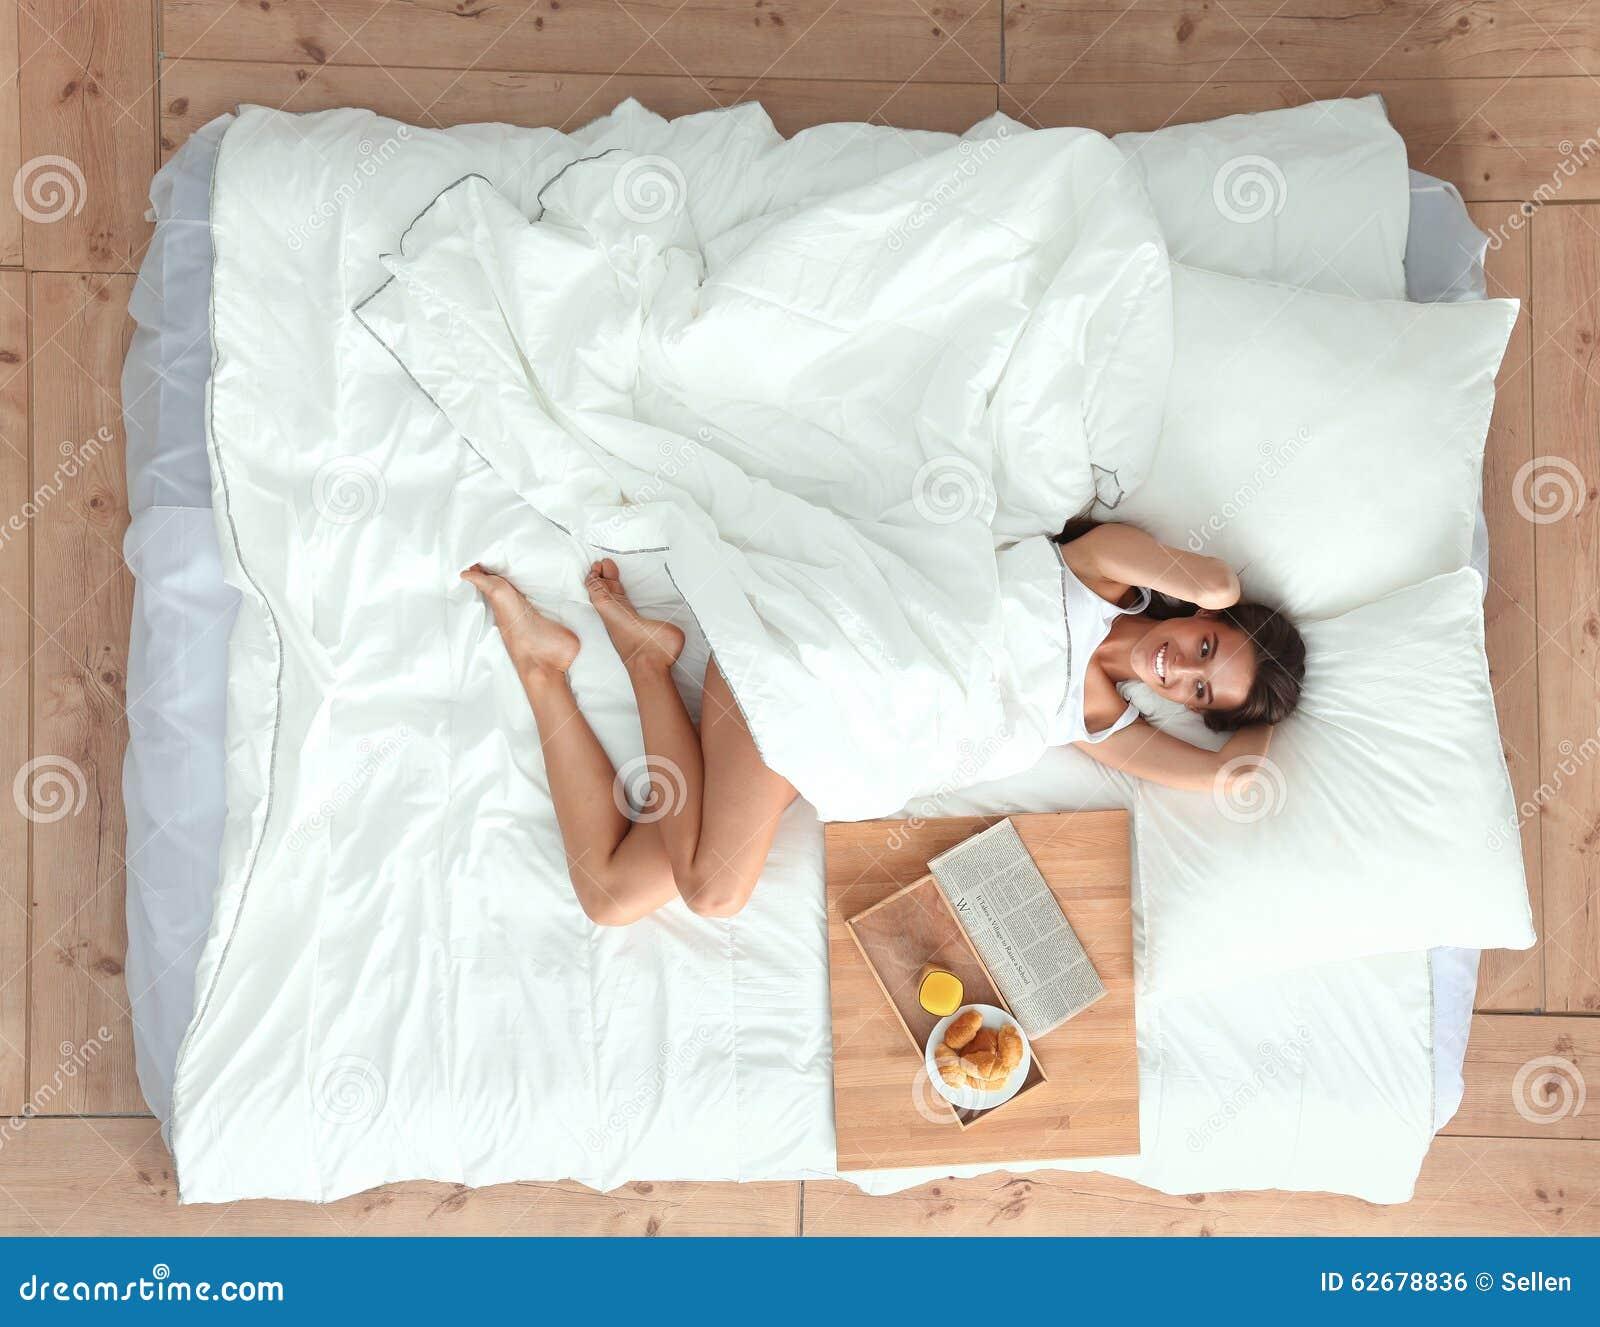 Диденко лежал на кровати а тотинку пришла домой